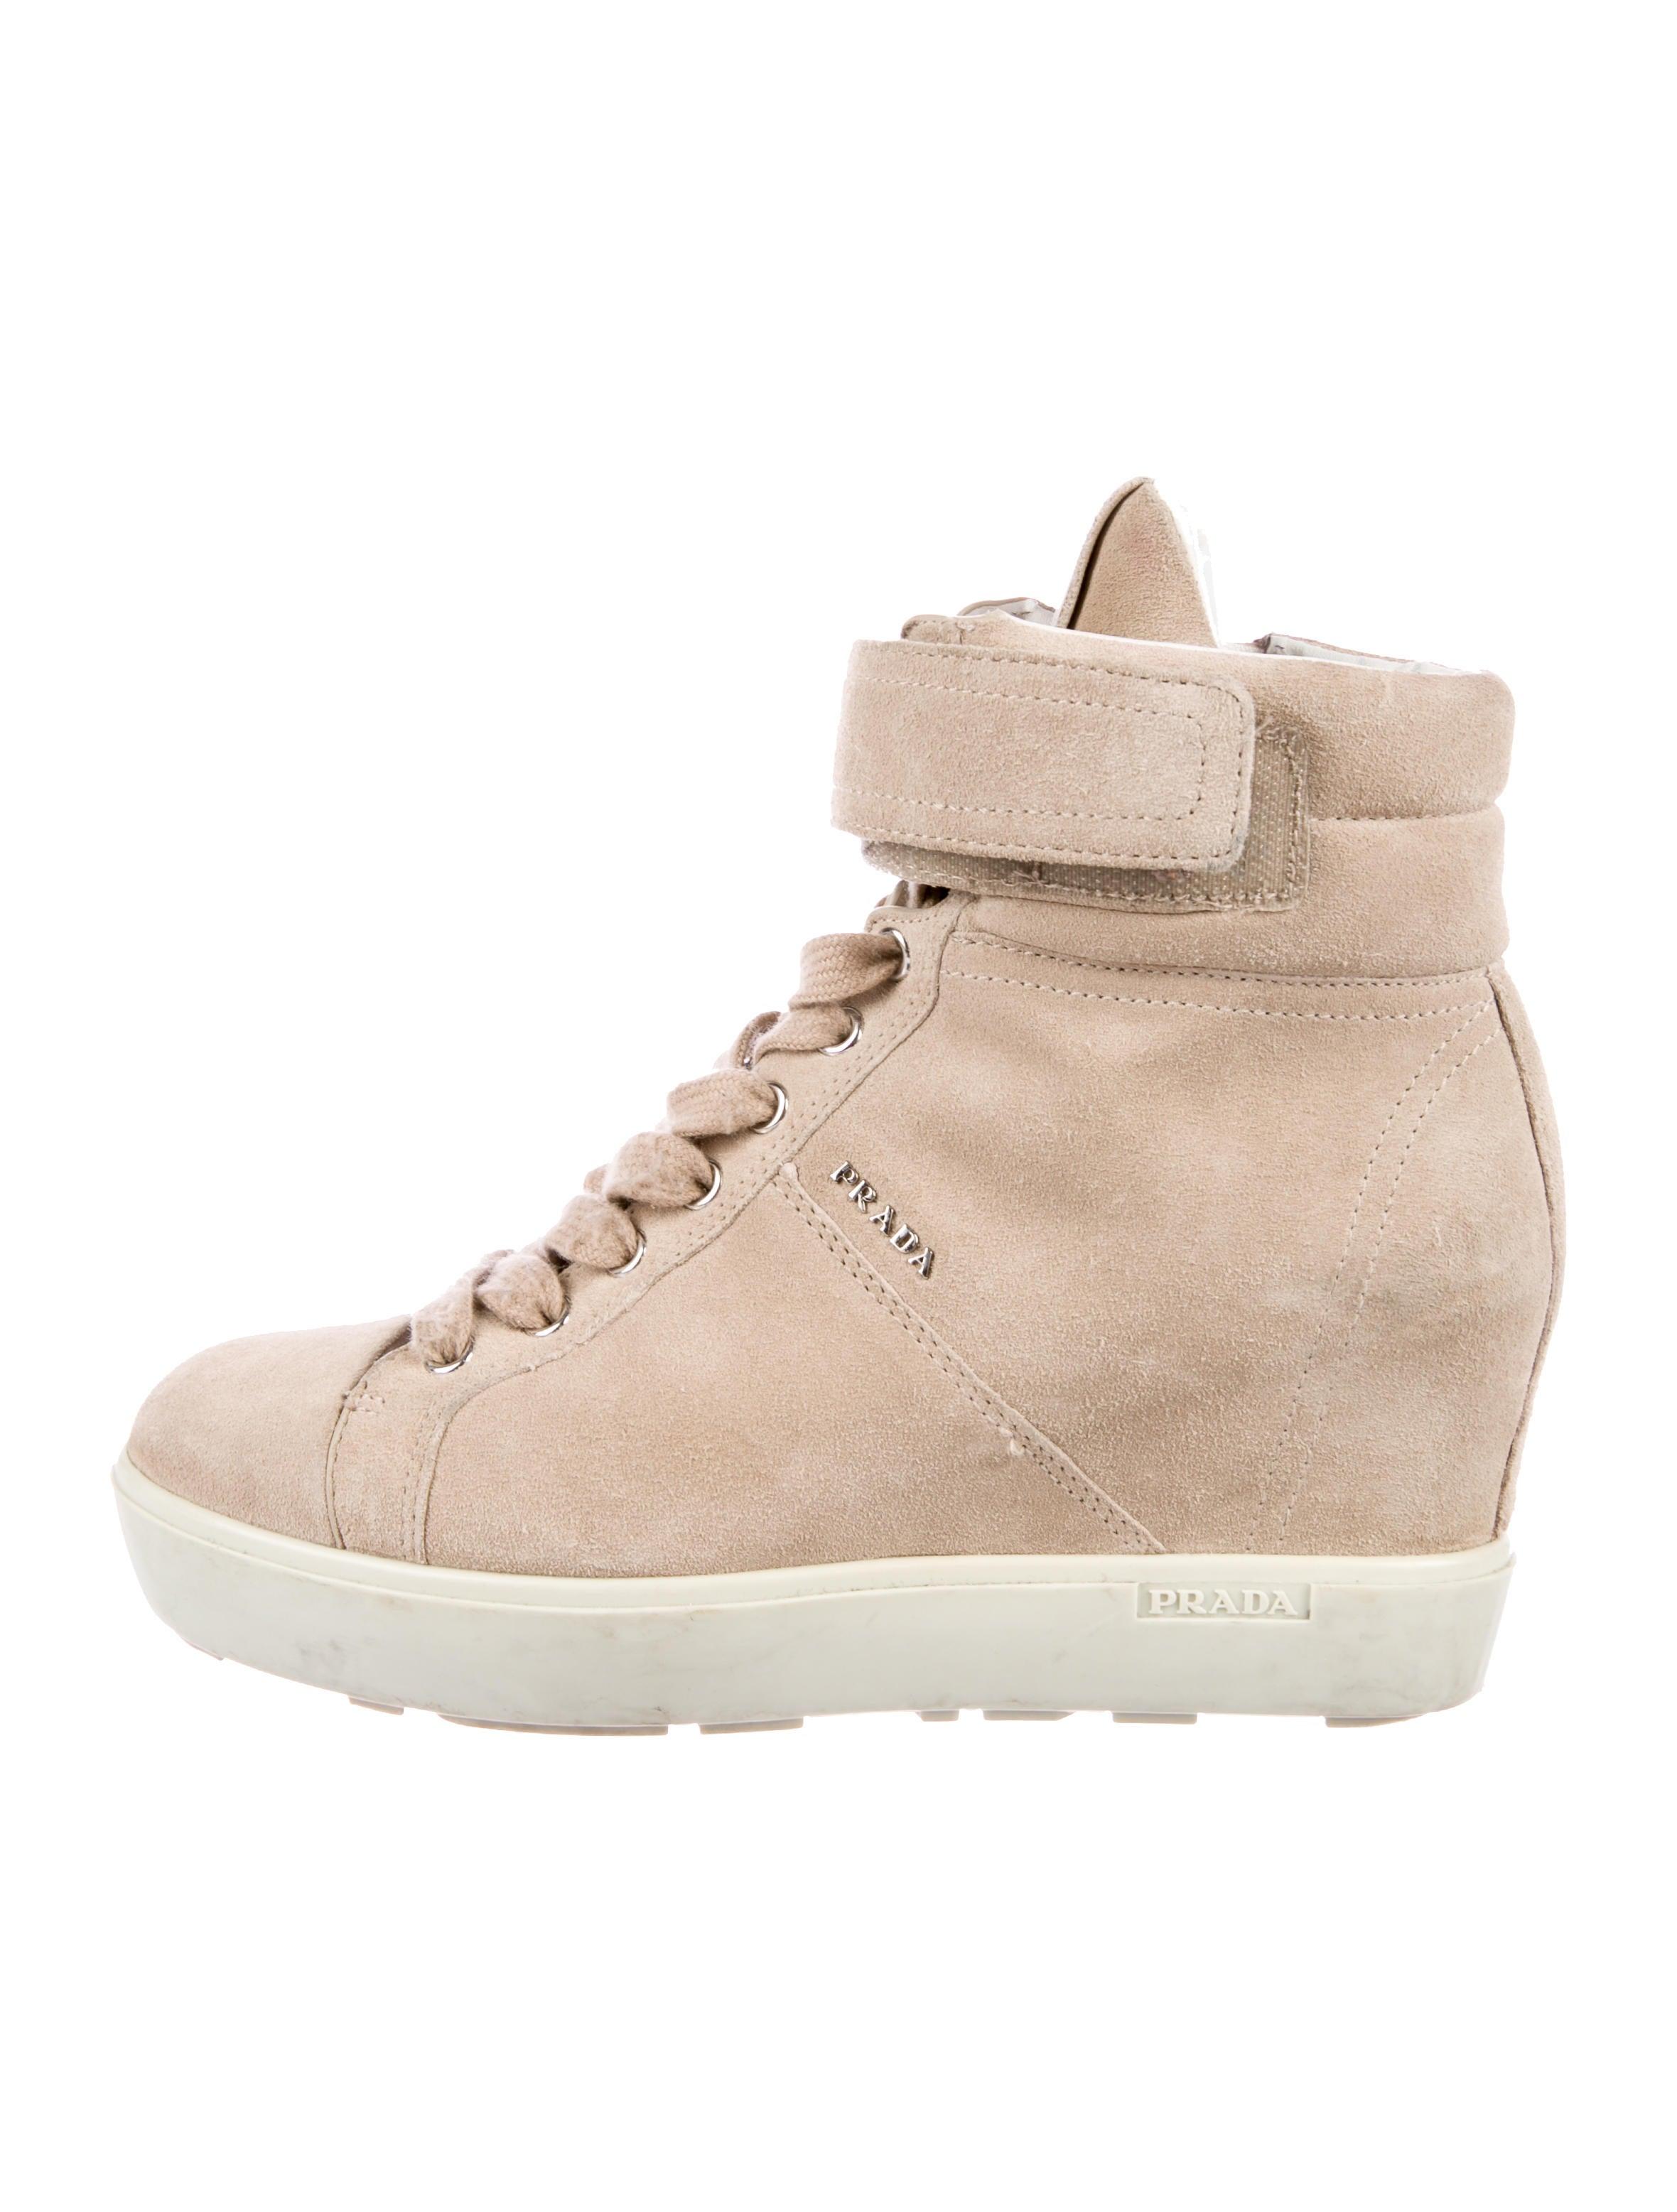 b4040e6dd17 Prada Sport Suede Wedge Sneakers - Shoes - WPR50469